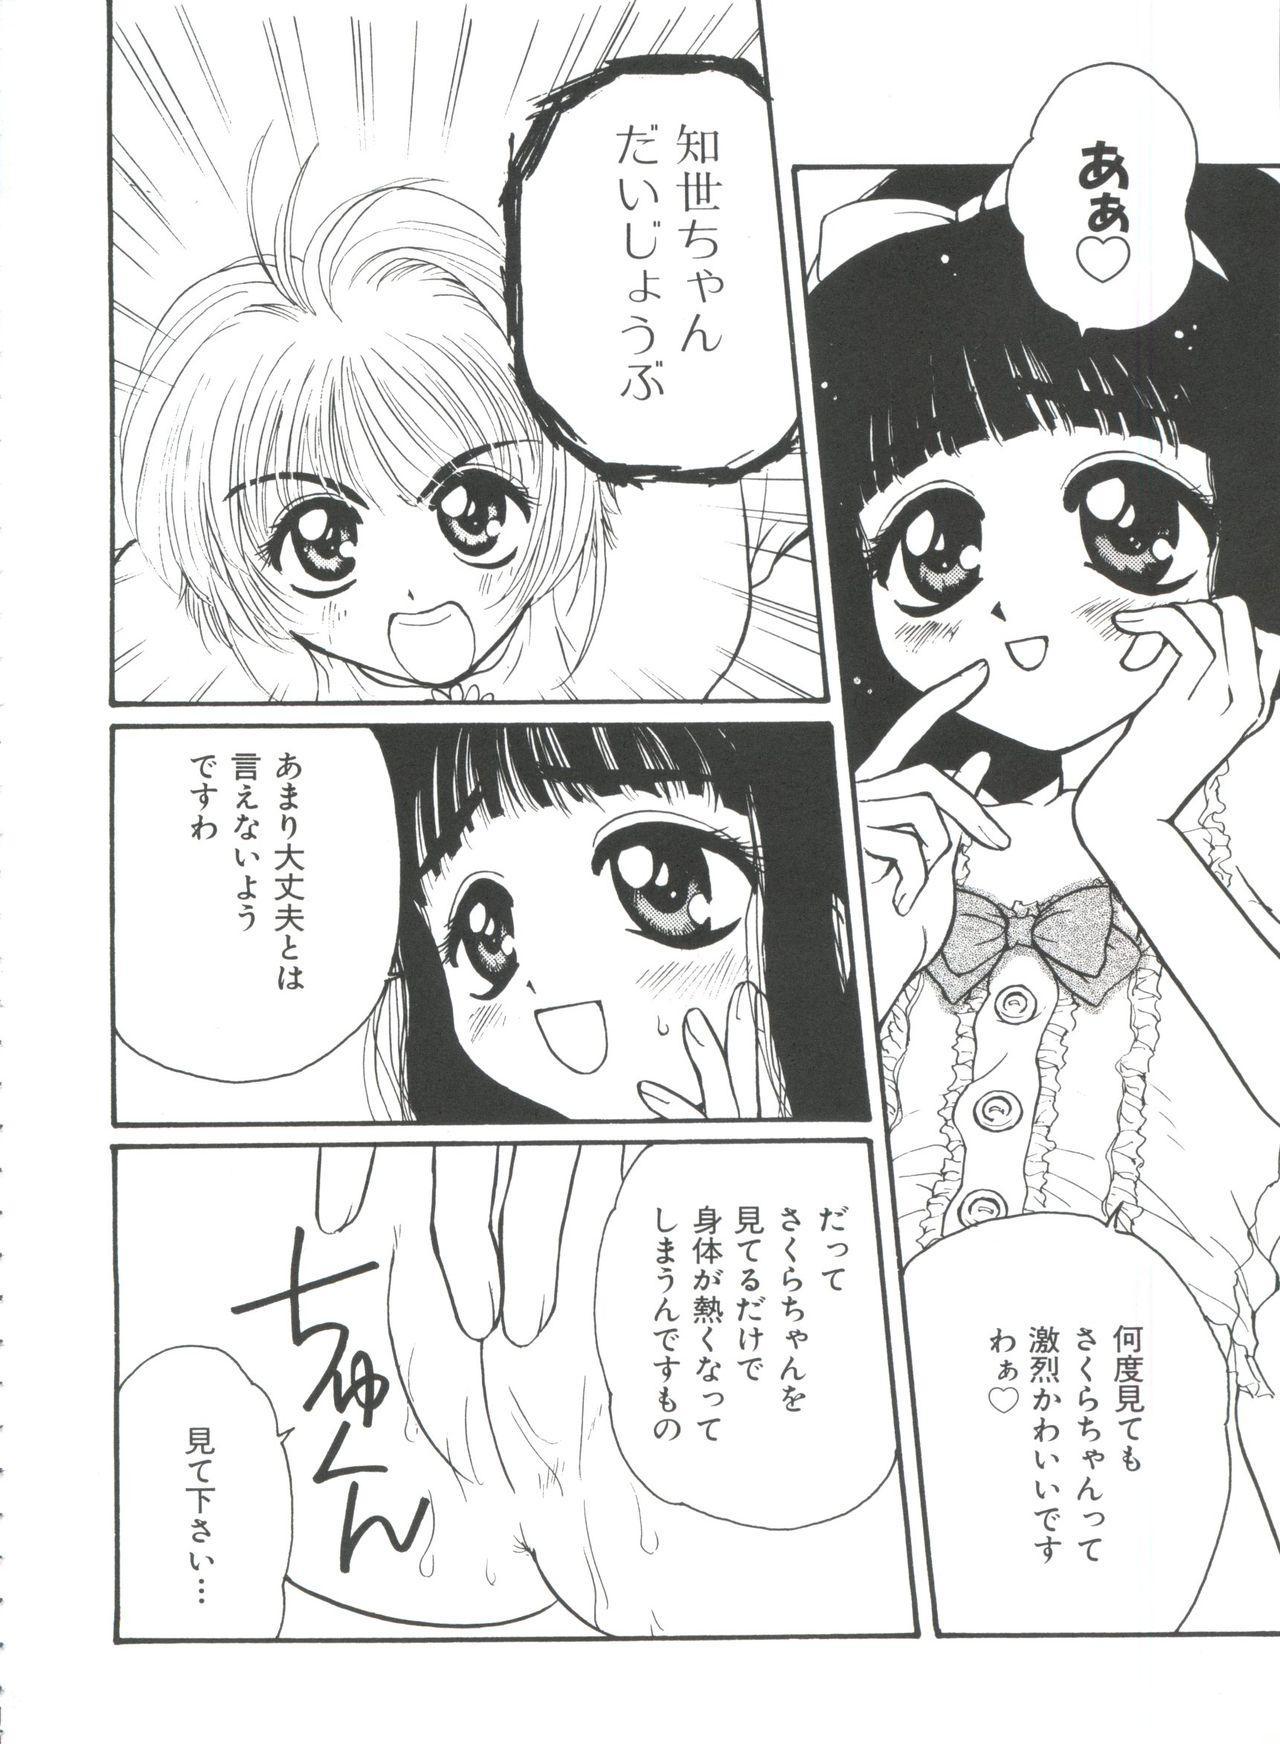 Ero-chan to Issho 3 19